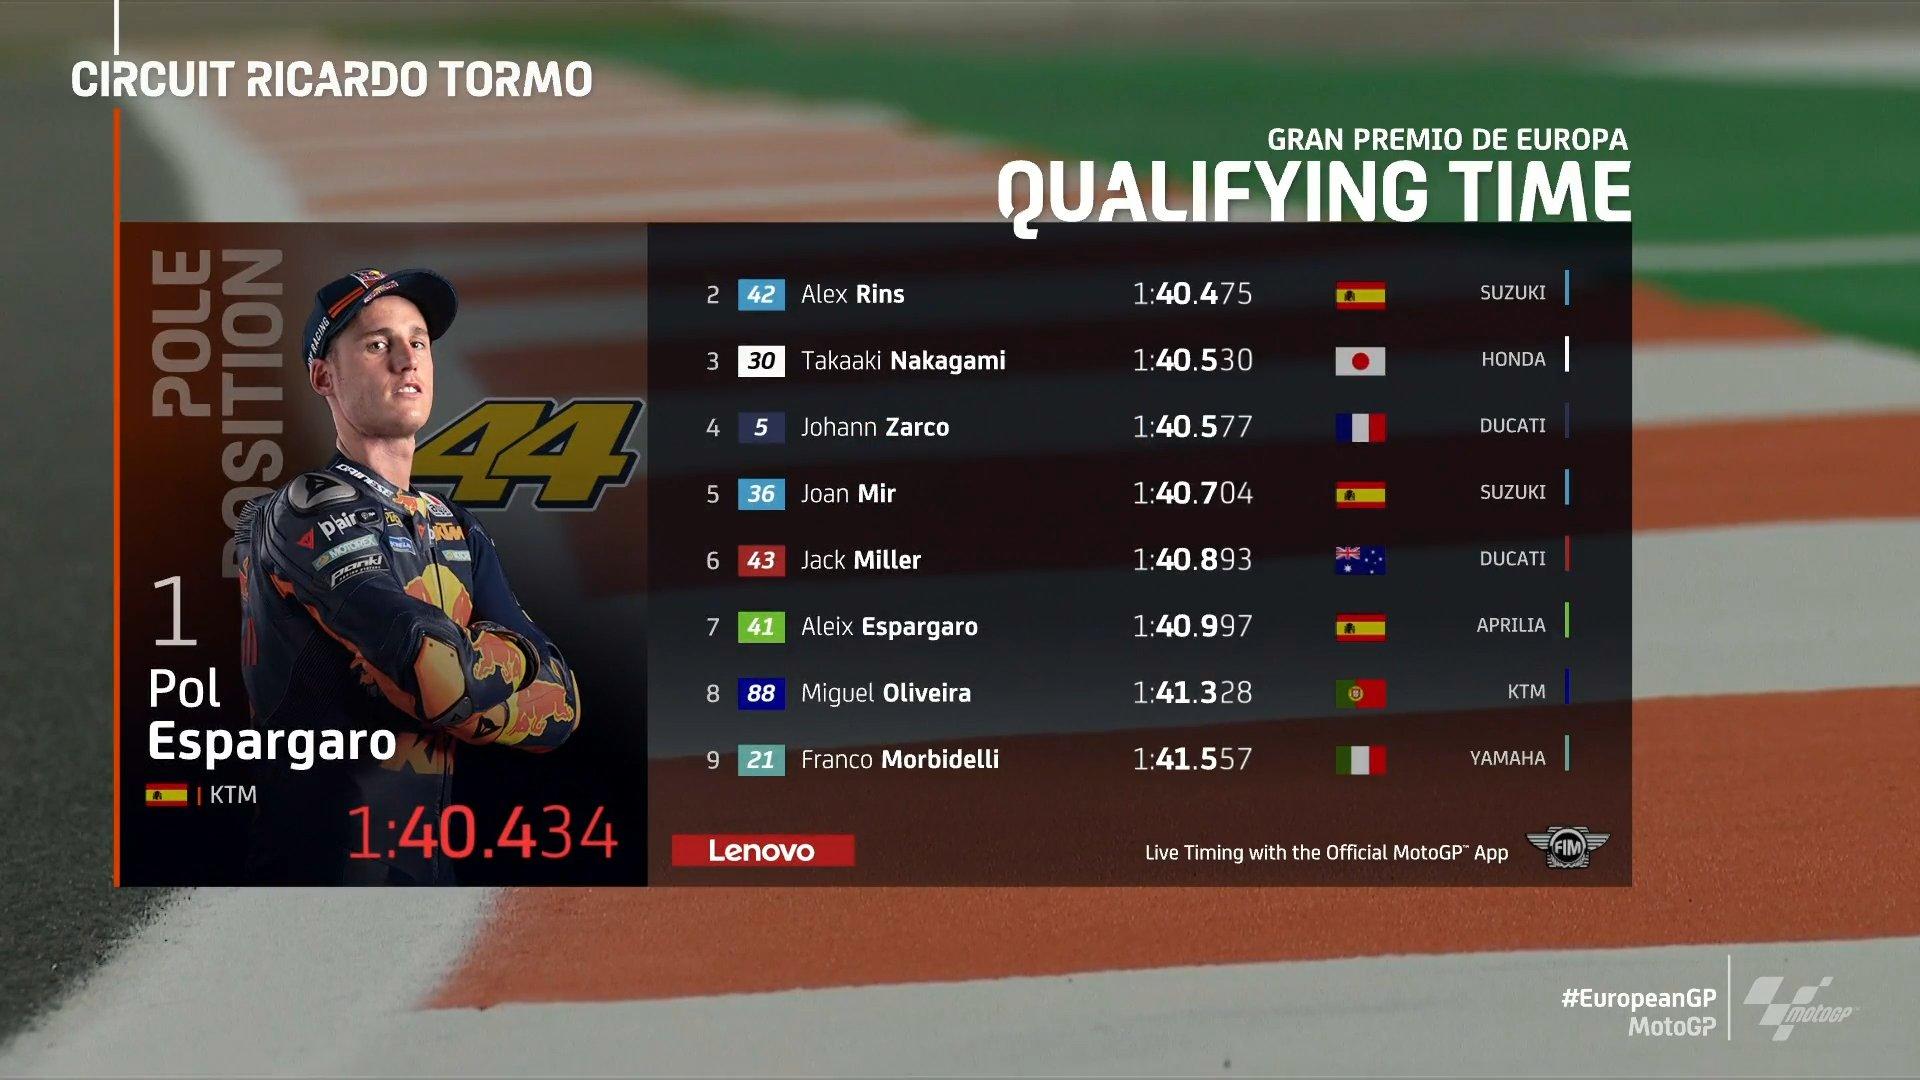 European MotoGP Live Stream Info November 08, 2020 & Qualifying Race Results